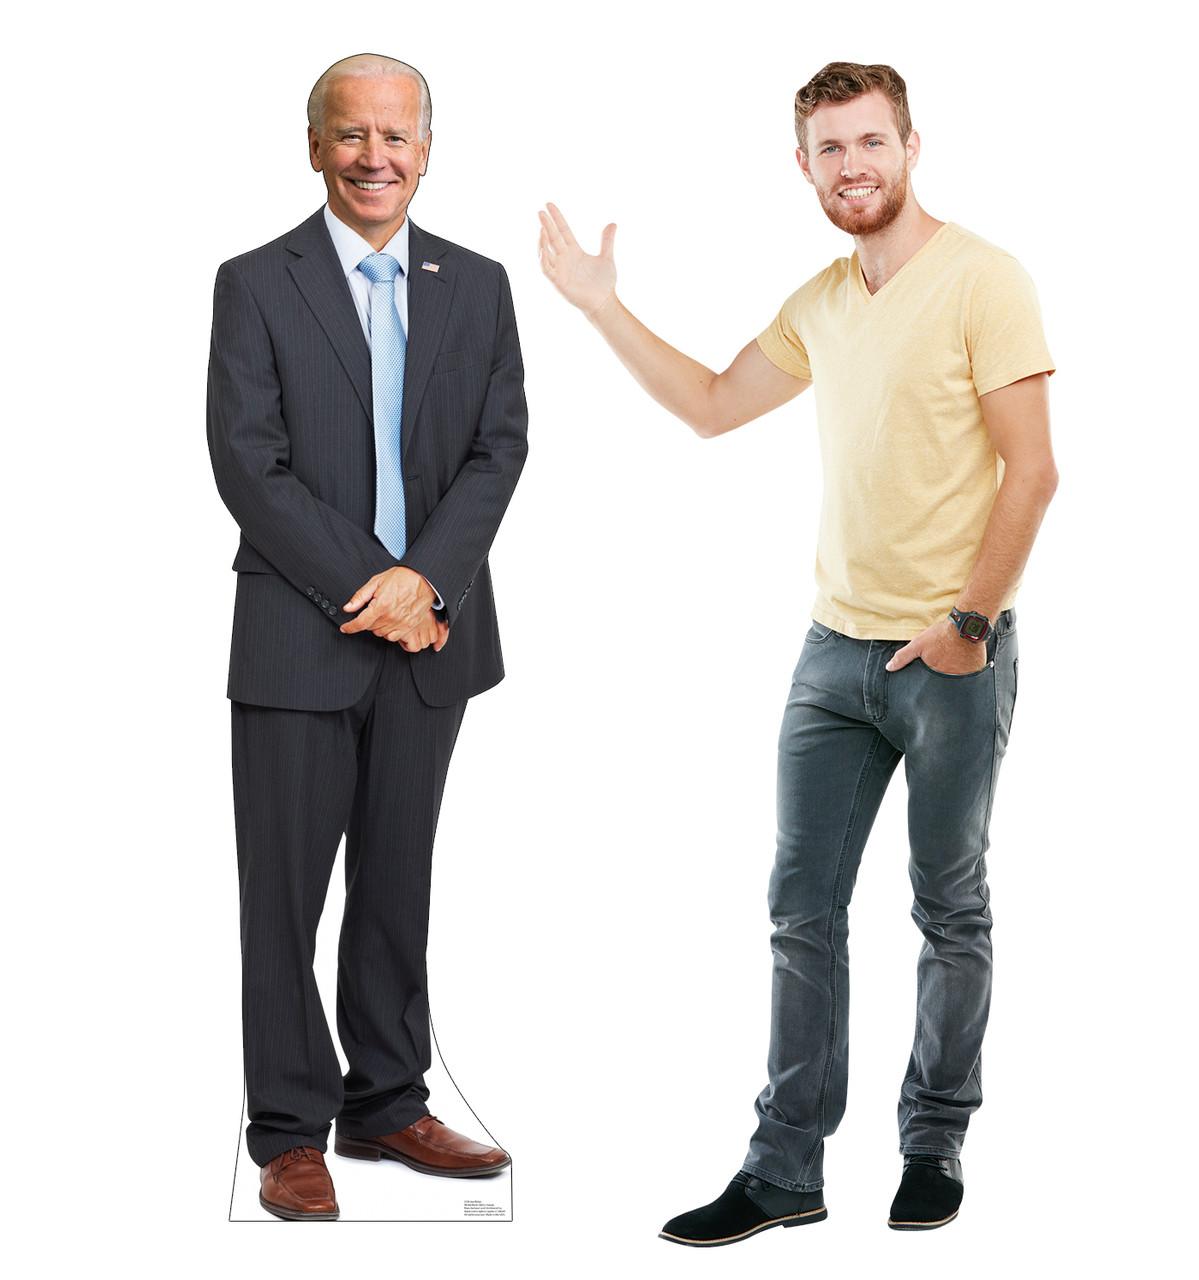 Life-size cardboard standee of Joe Biden with model.